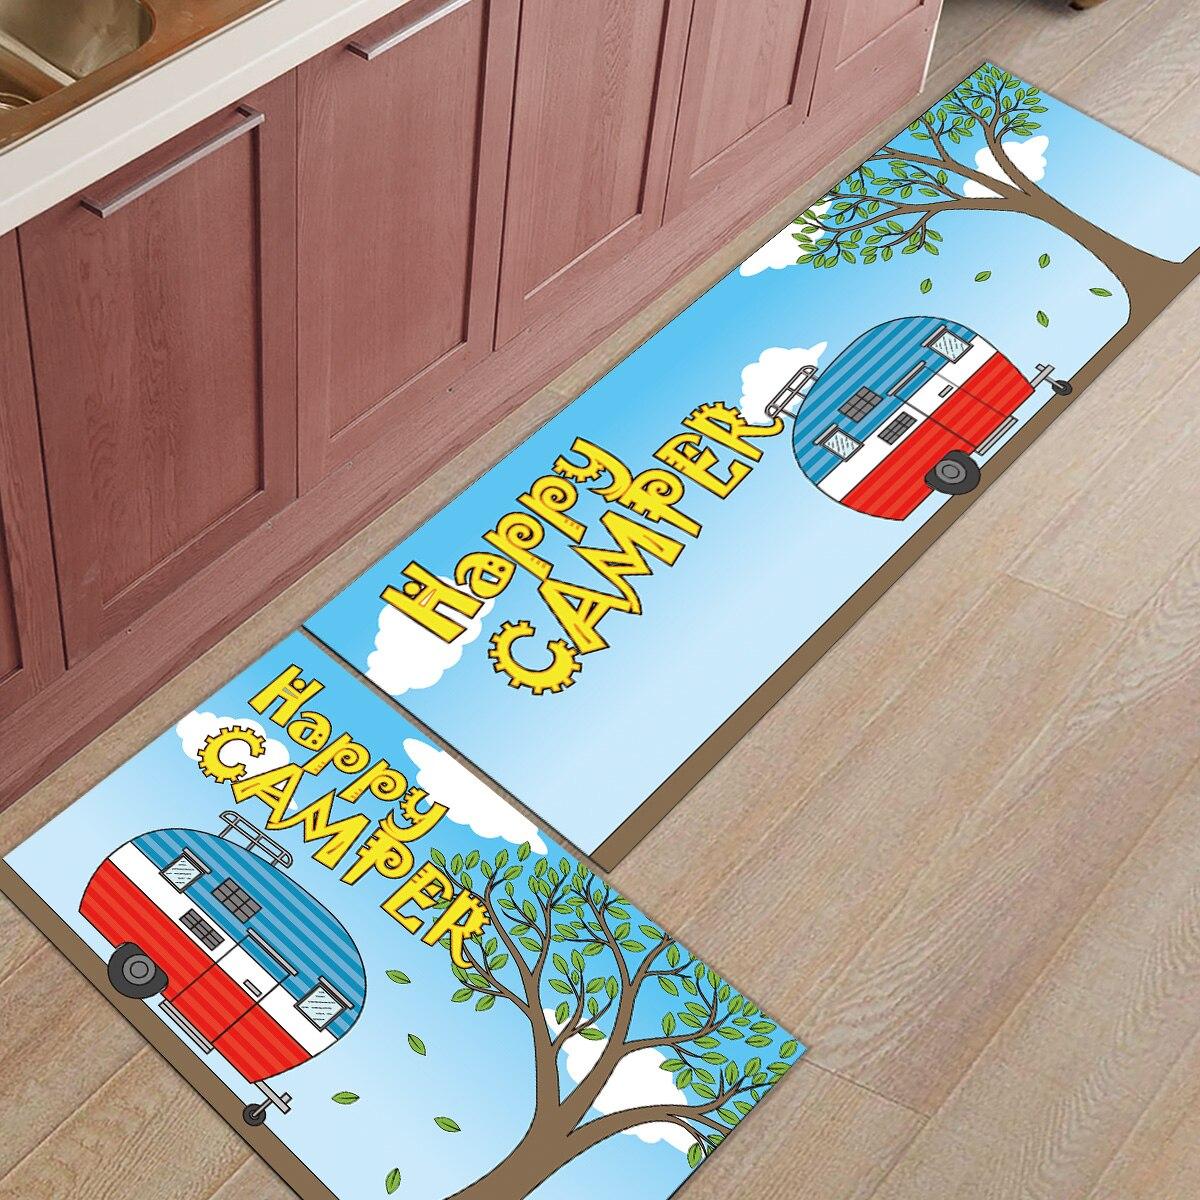 Vintage Caravan 2 Piece Mat For Kitchen Under A Pet Water Food Bowl Doormats For Entrance Way Bathroom Accessories Set Dirt